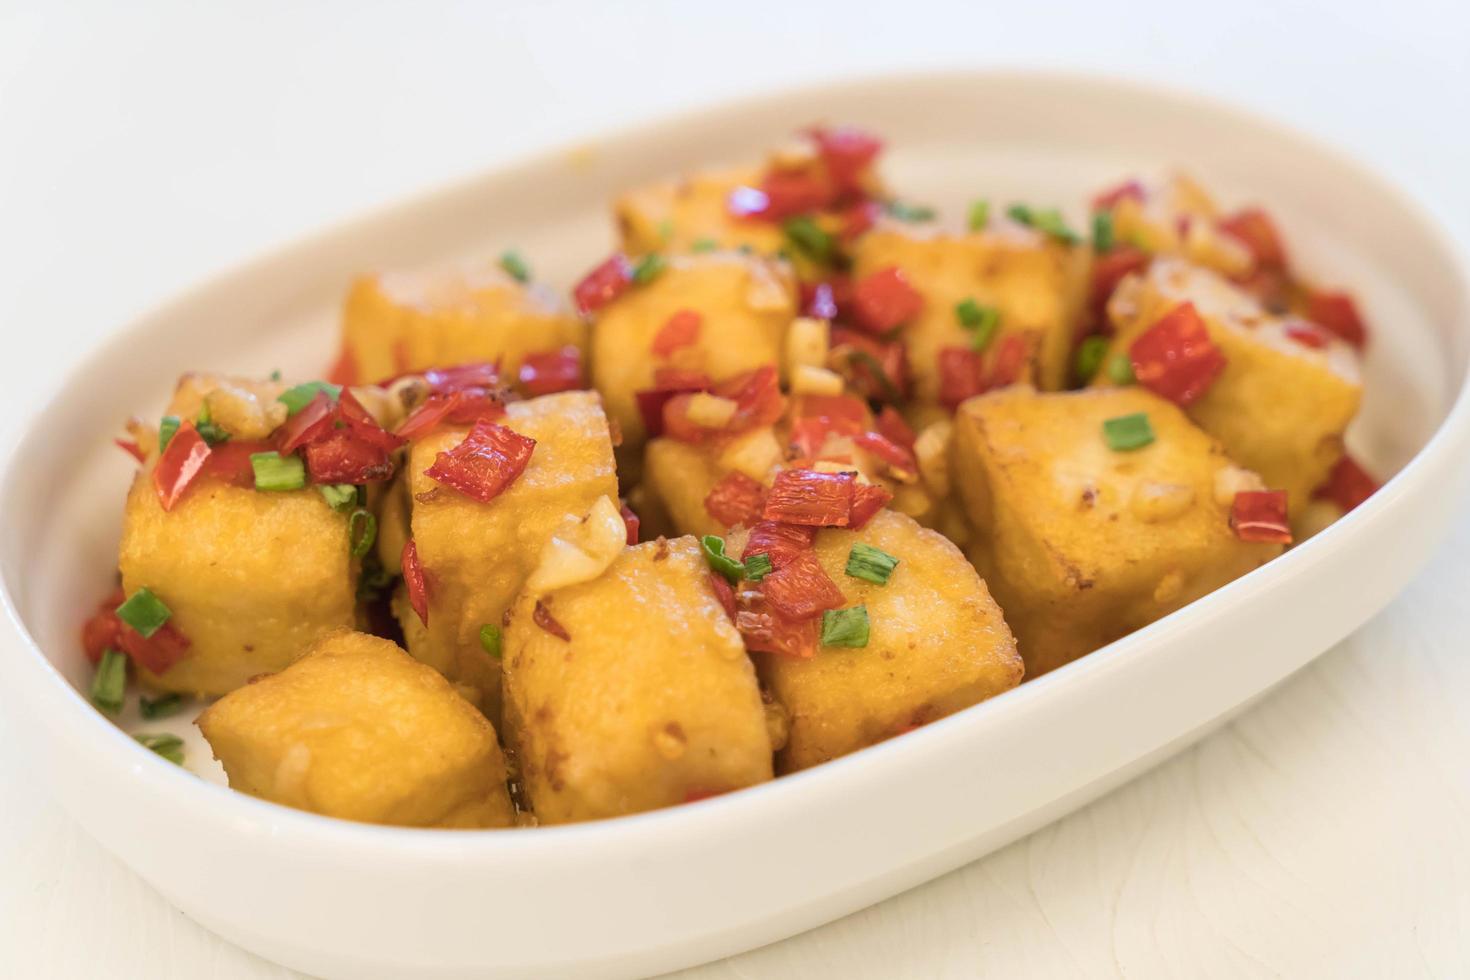 gebratenes Tofu-Chili-Salz foto